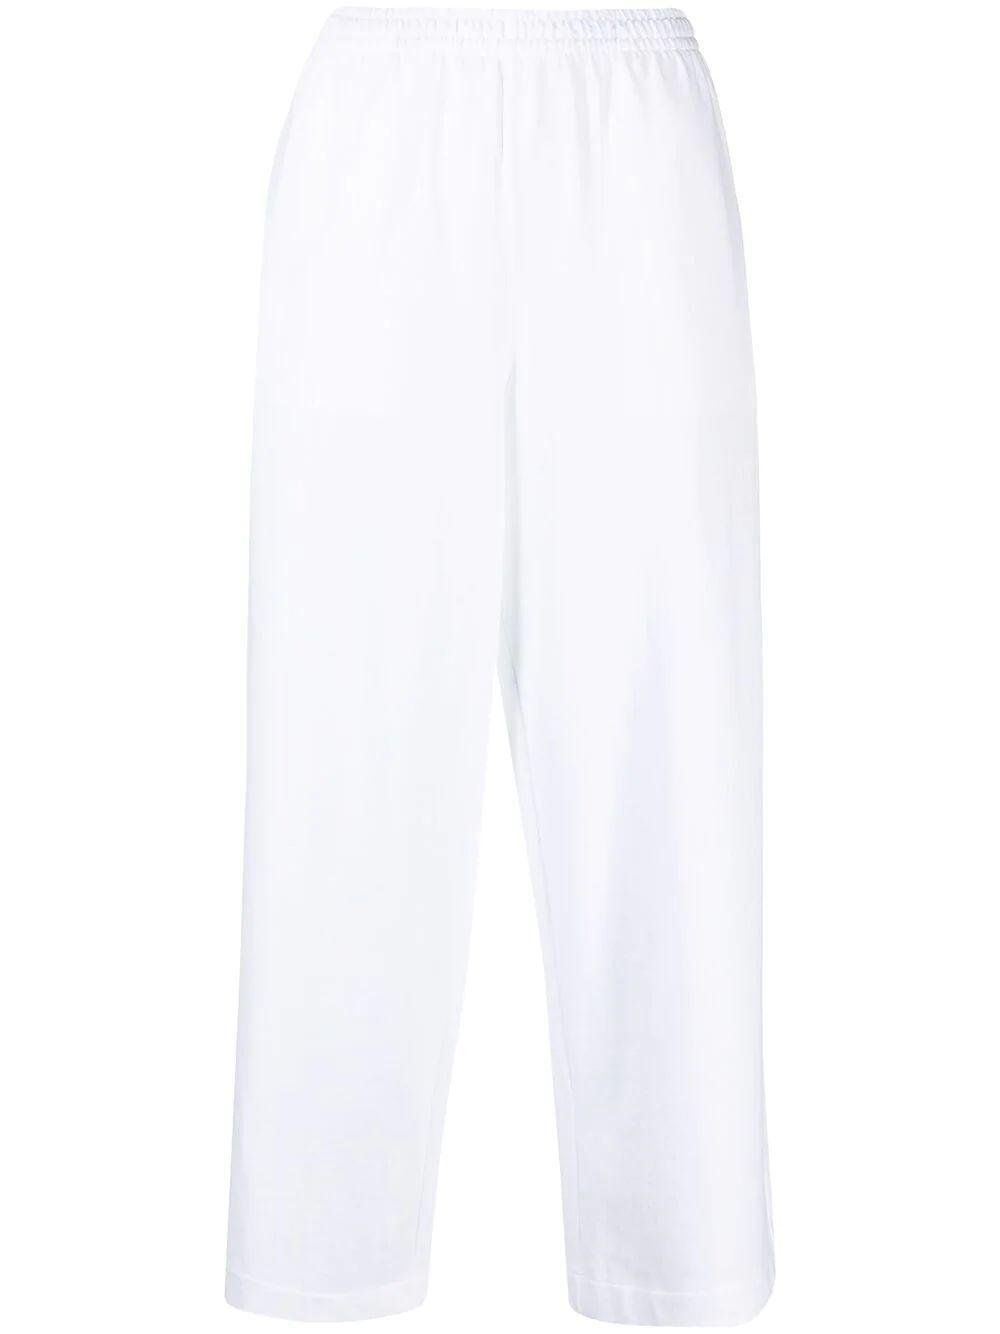 Wide Leg Cropped Pant